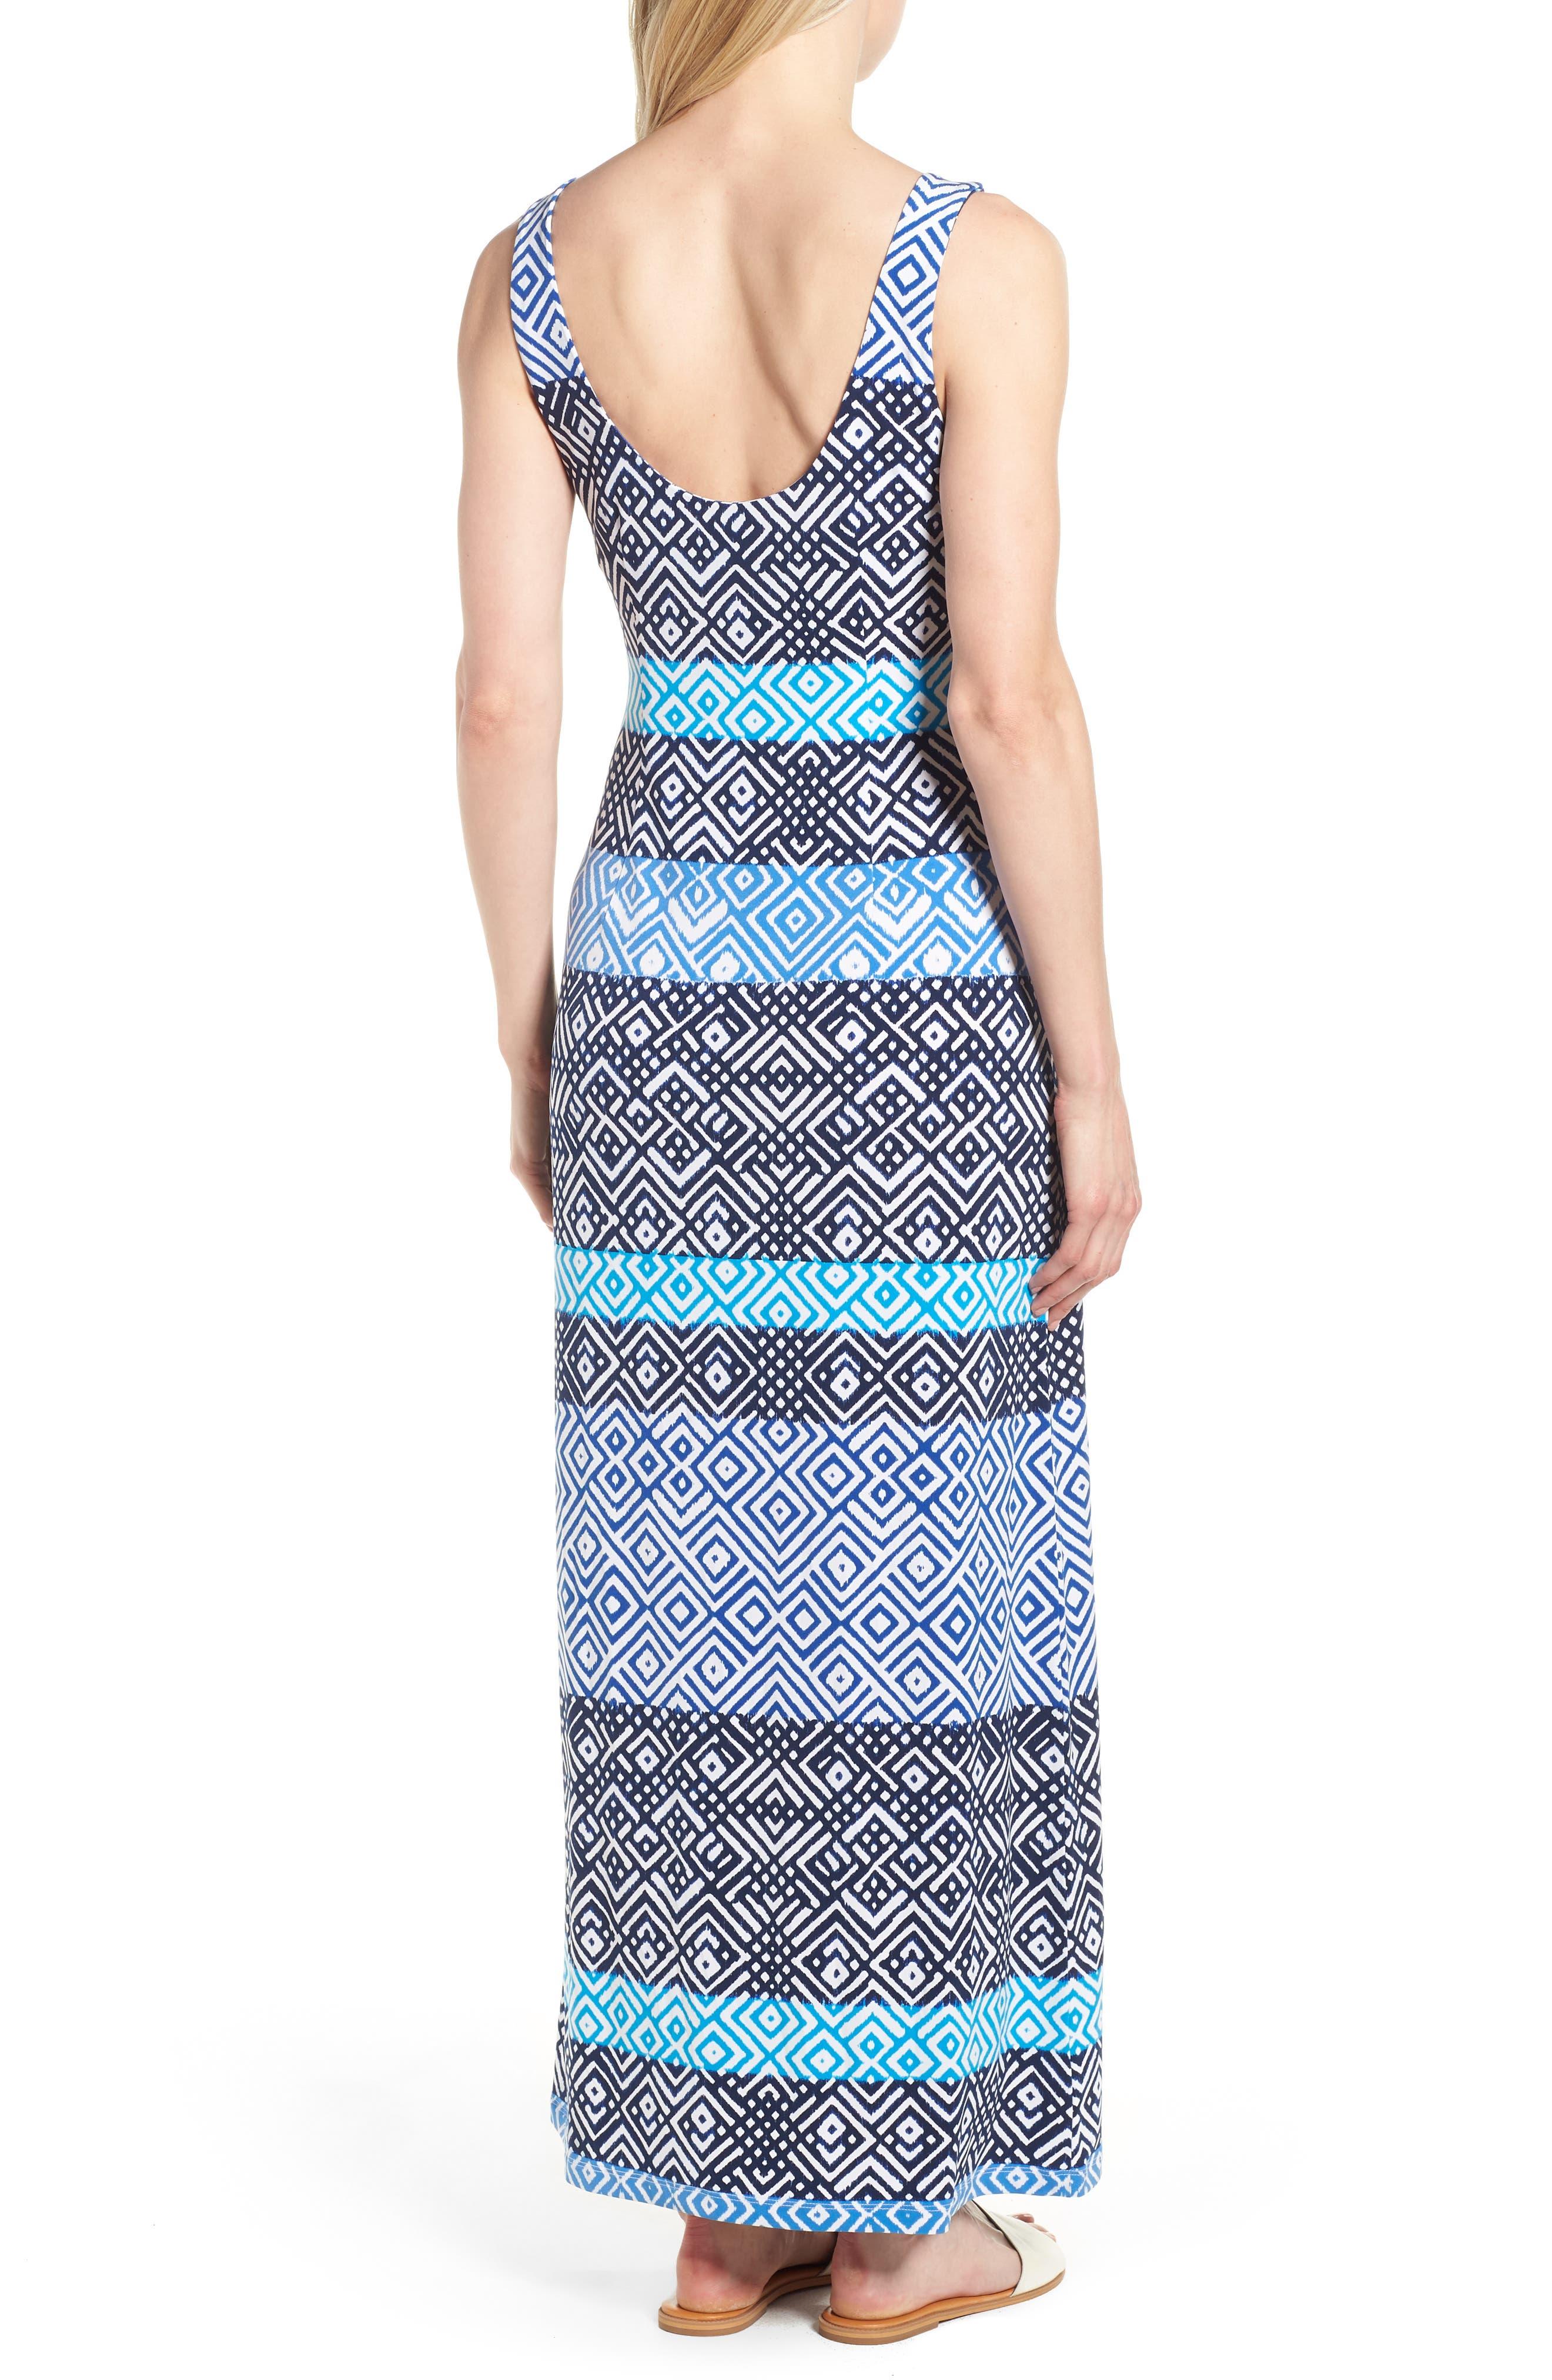 Mayan Maze Maxi Dress,                             Alternate thumbnail 2, color,                             Ocean Deep